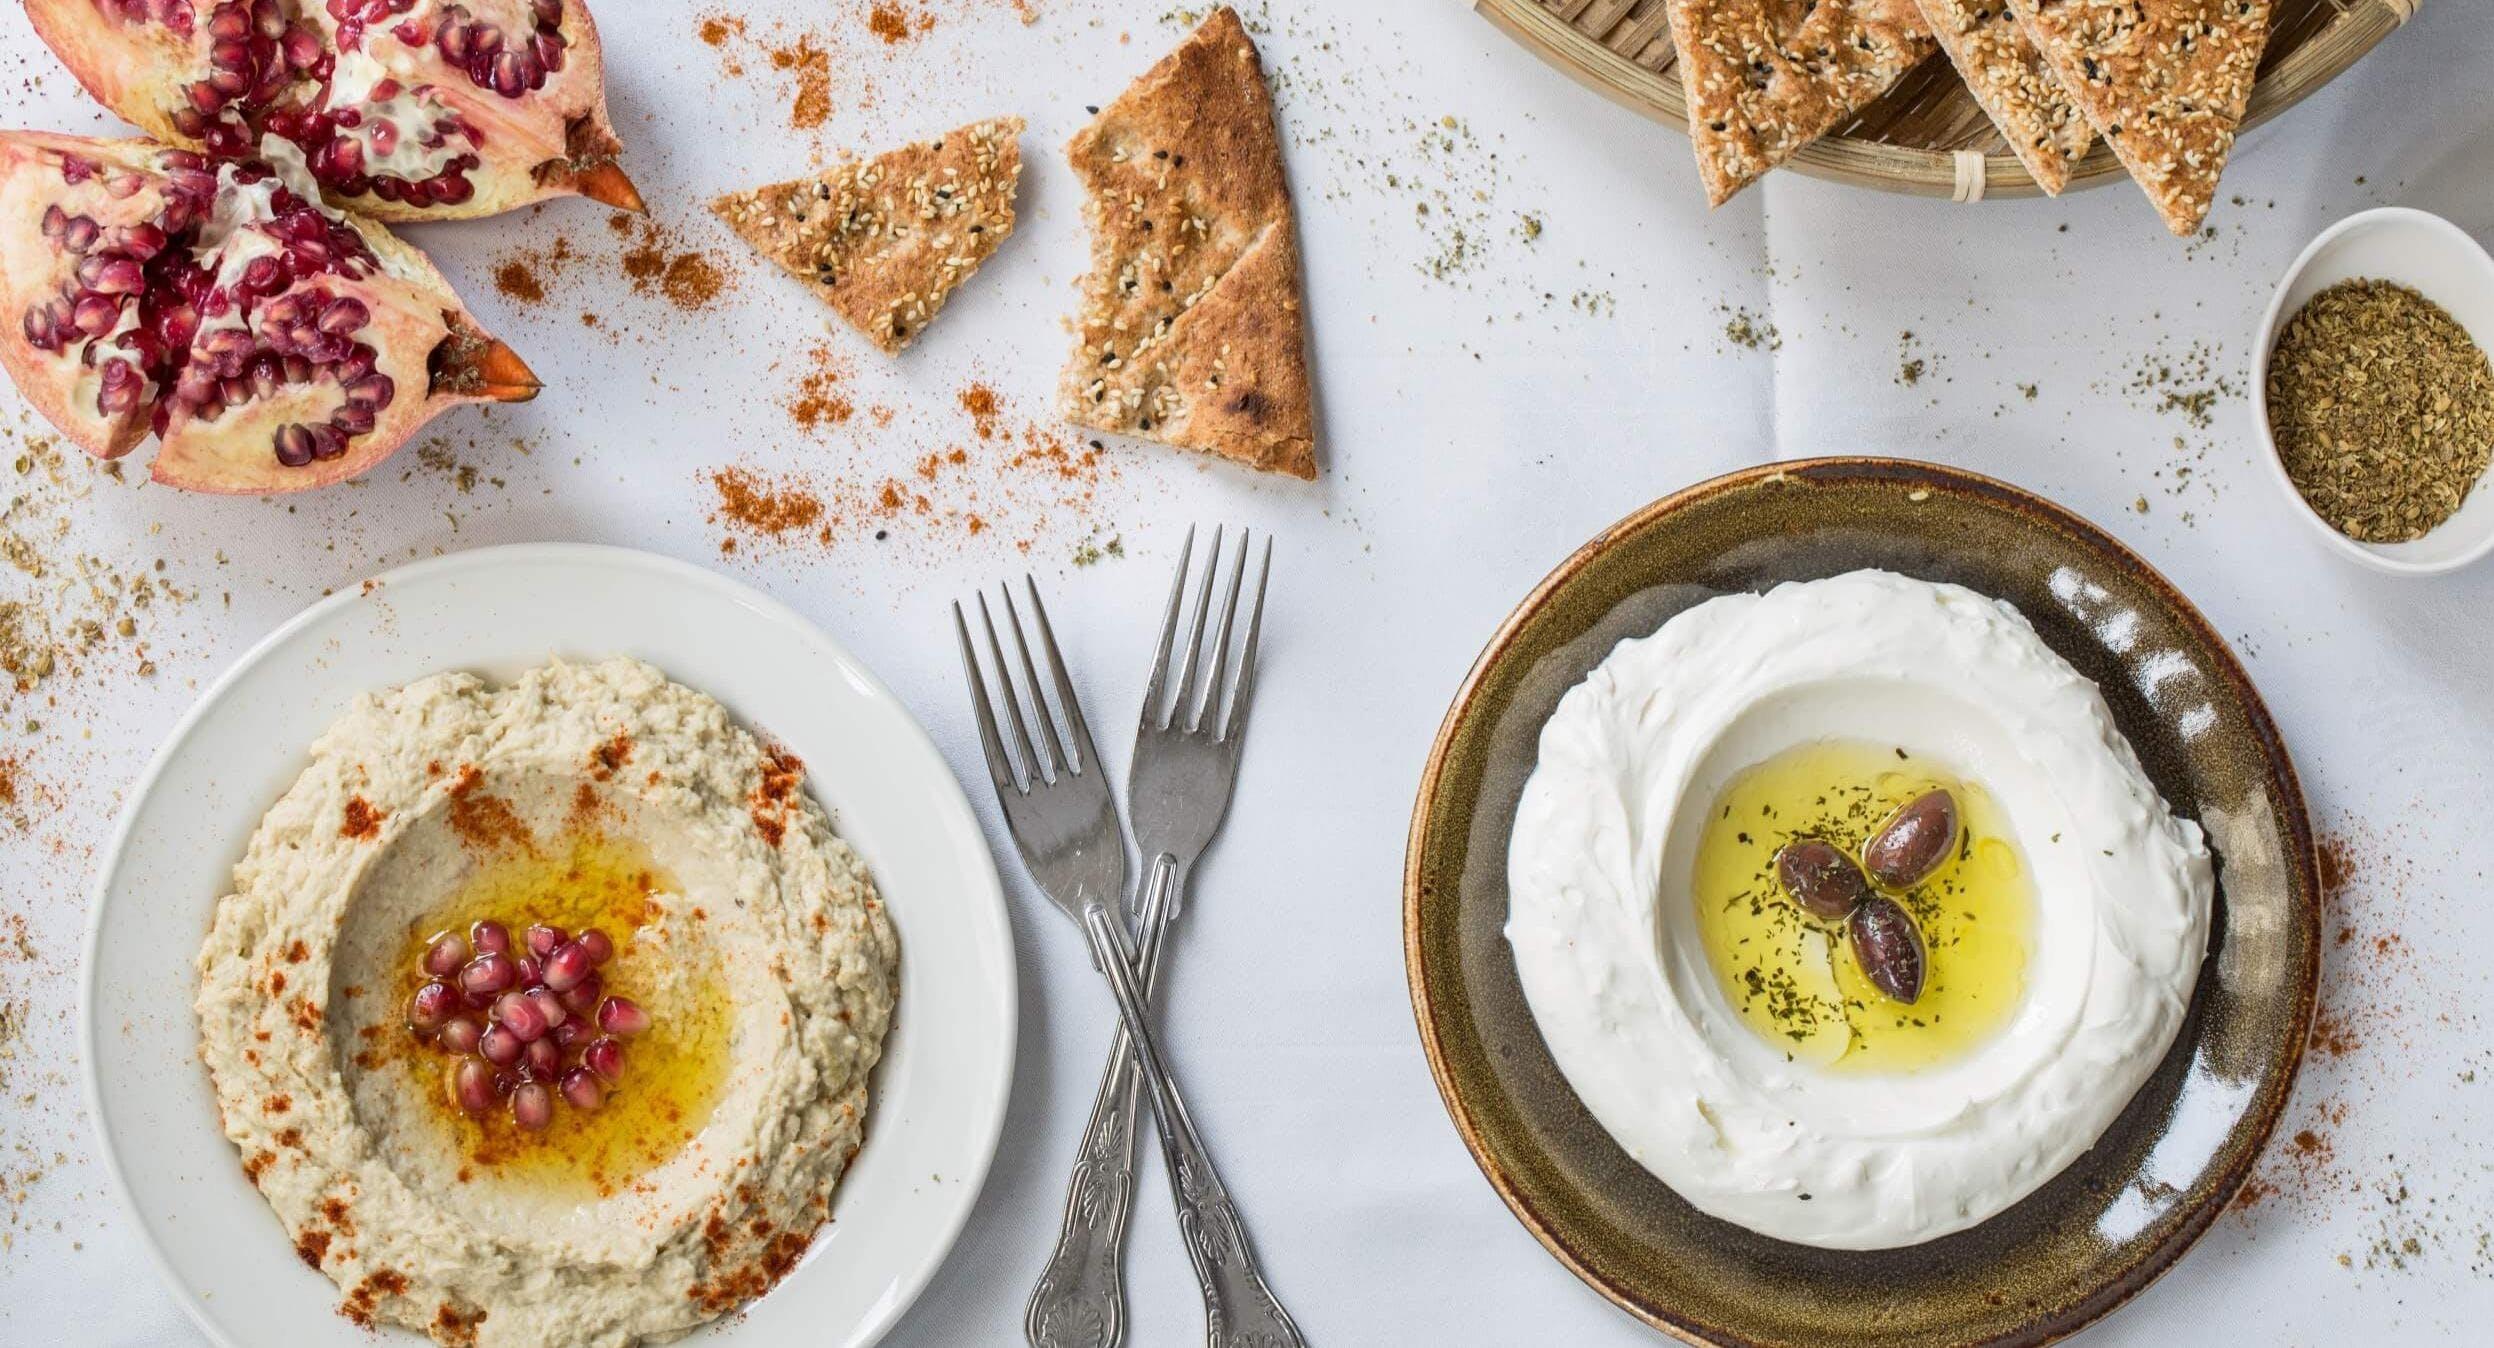 Ishbilia Lebanese Cuisine